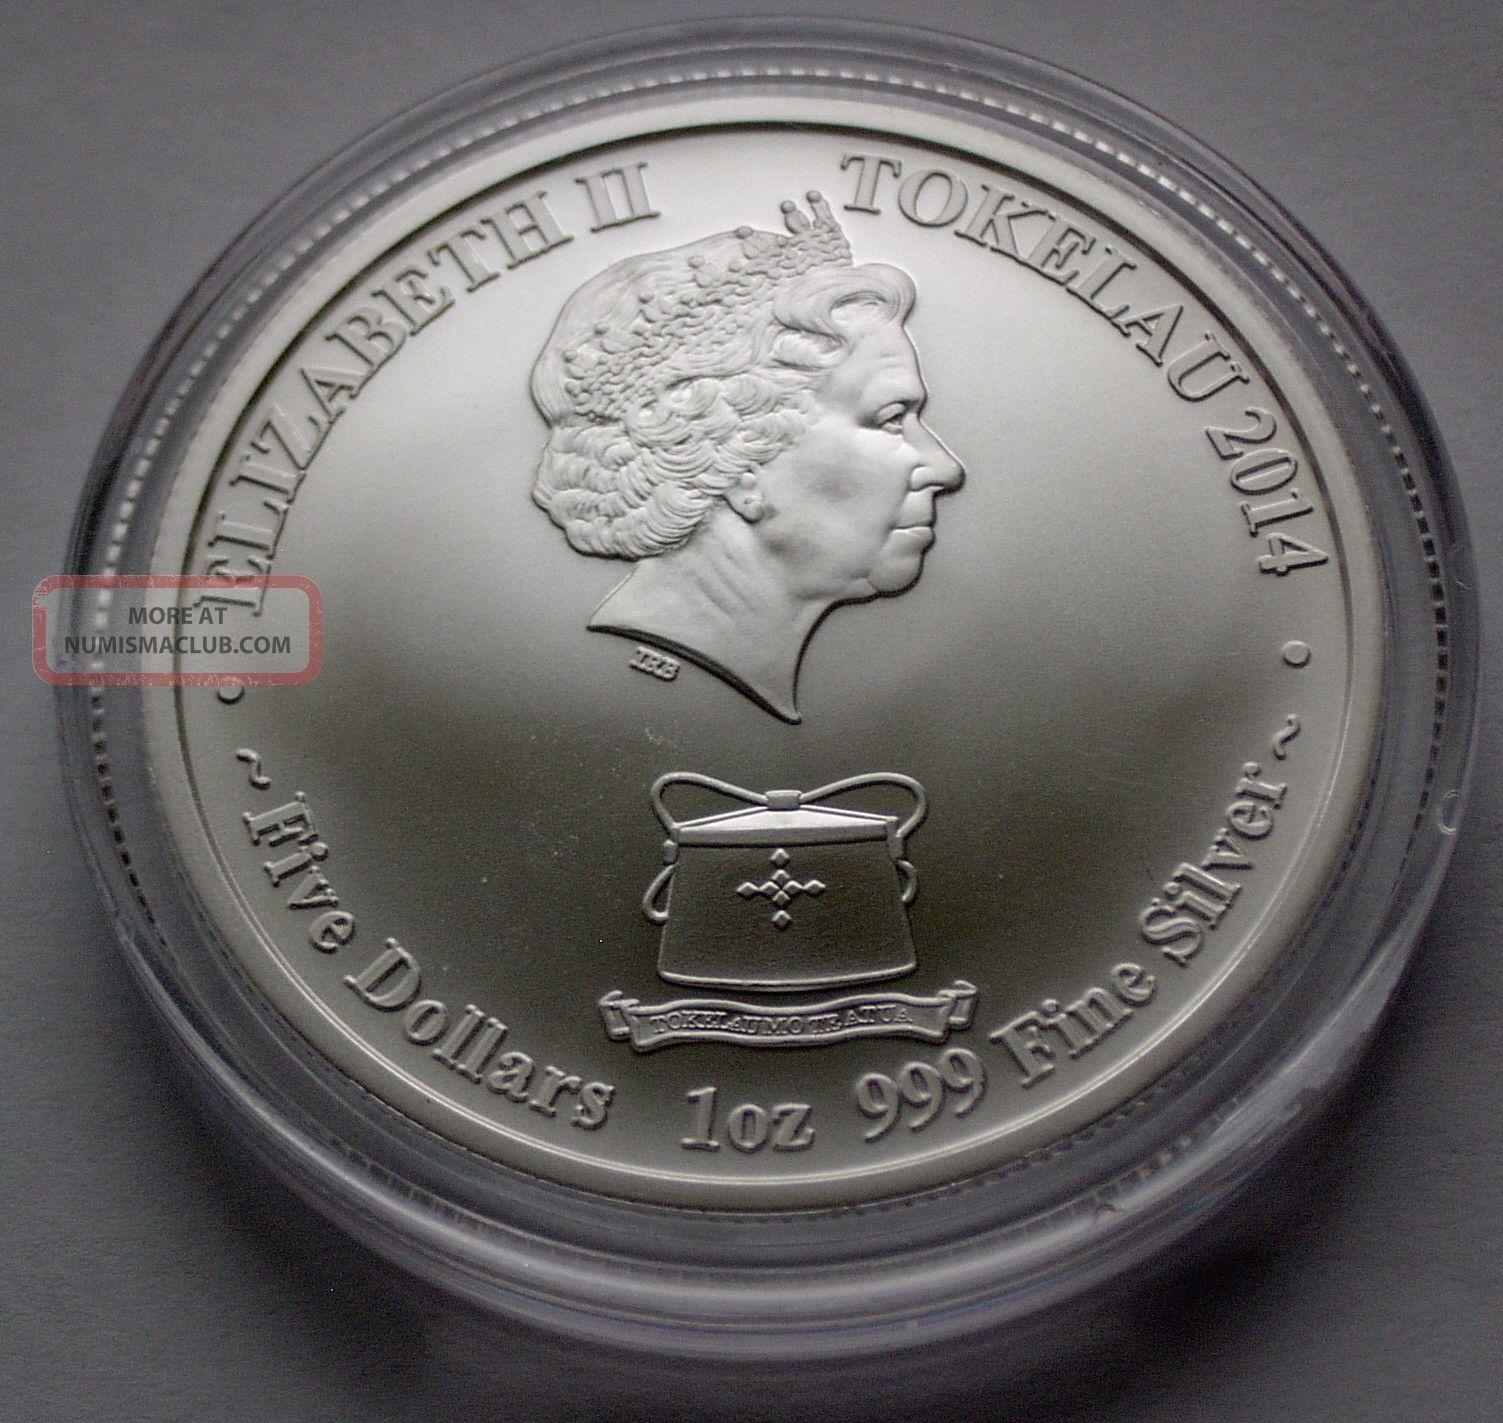 2014 Tokelau Lunar Horse 24 Ct Gold Gilded $5 Coin Rare Max 1, 000